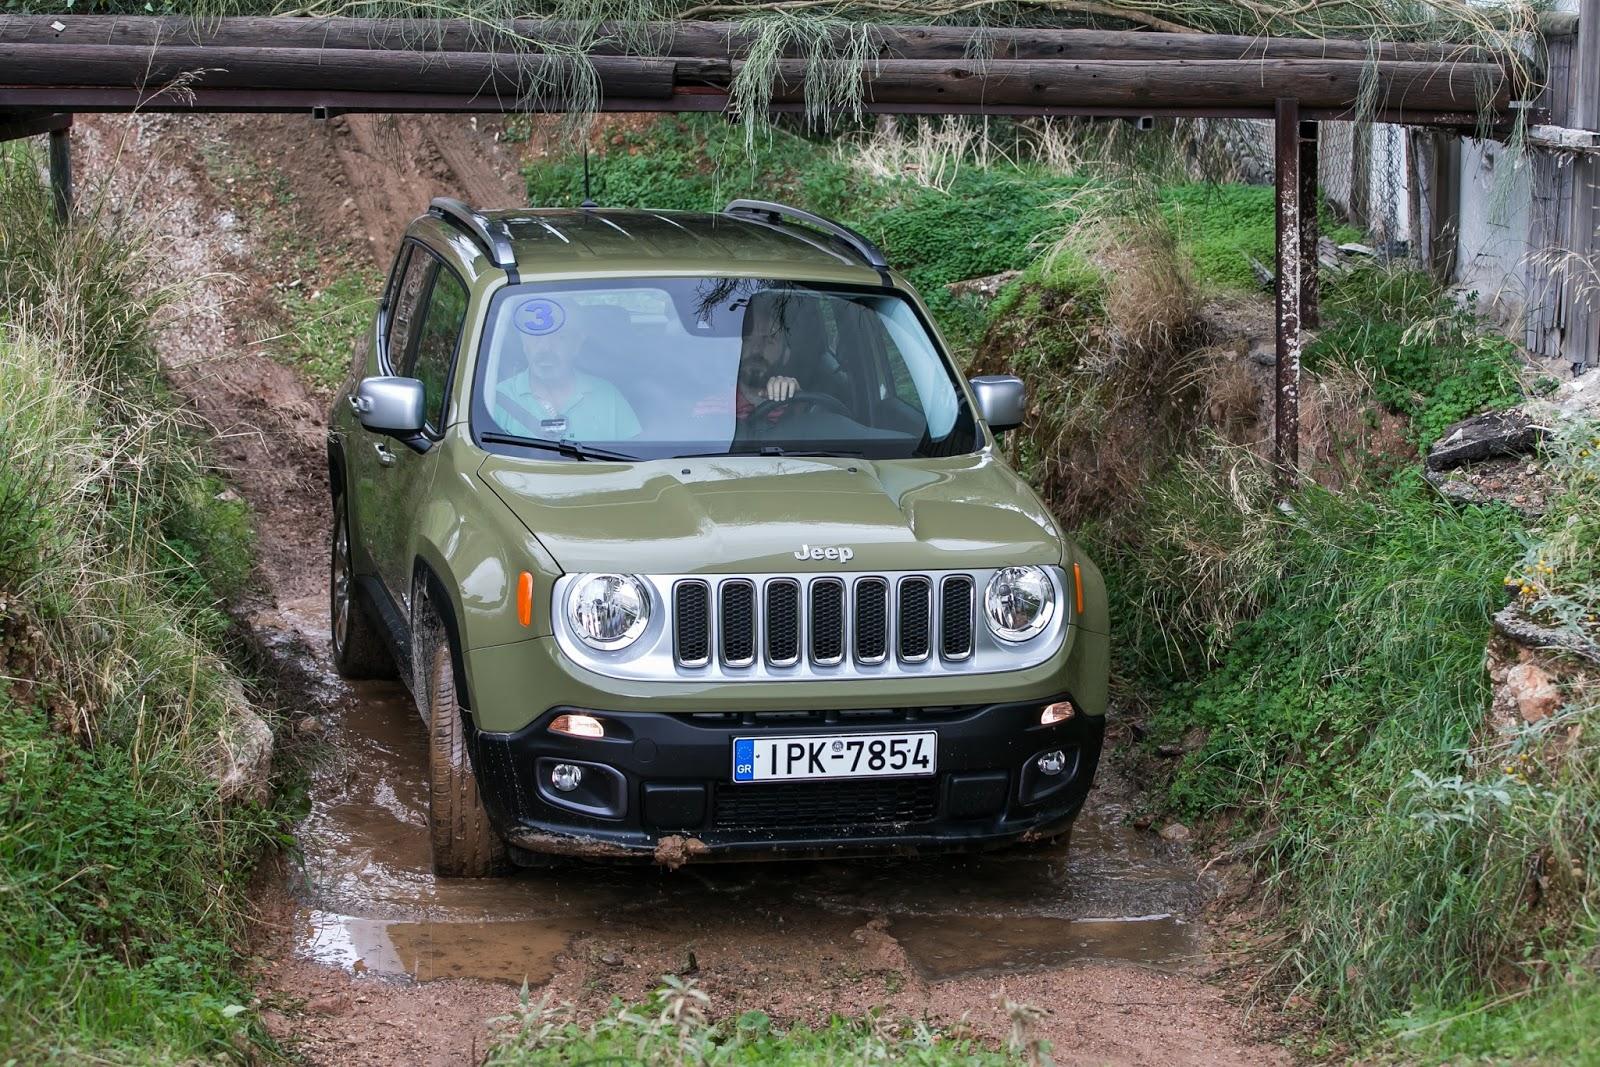 KF 1545 Πετάμε ένα Jeep Renegade σε λάσπες, πέτρες, άμμο, λίμνες. Θα τα καταφέρει; Jeep, Jeep Renegade, Renegade, SUV, TEST, zblog, ΔΟΚΙΜΕΣ